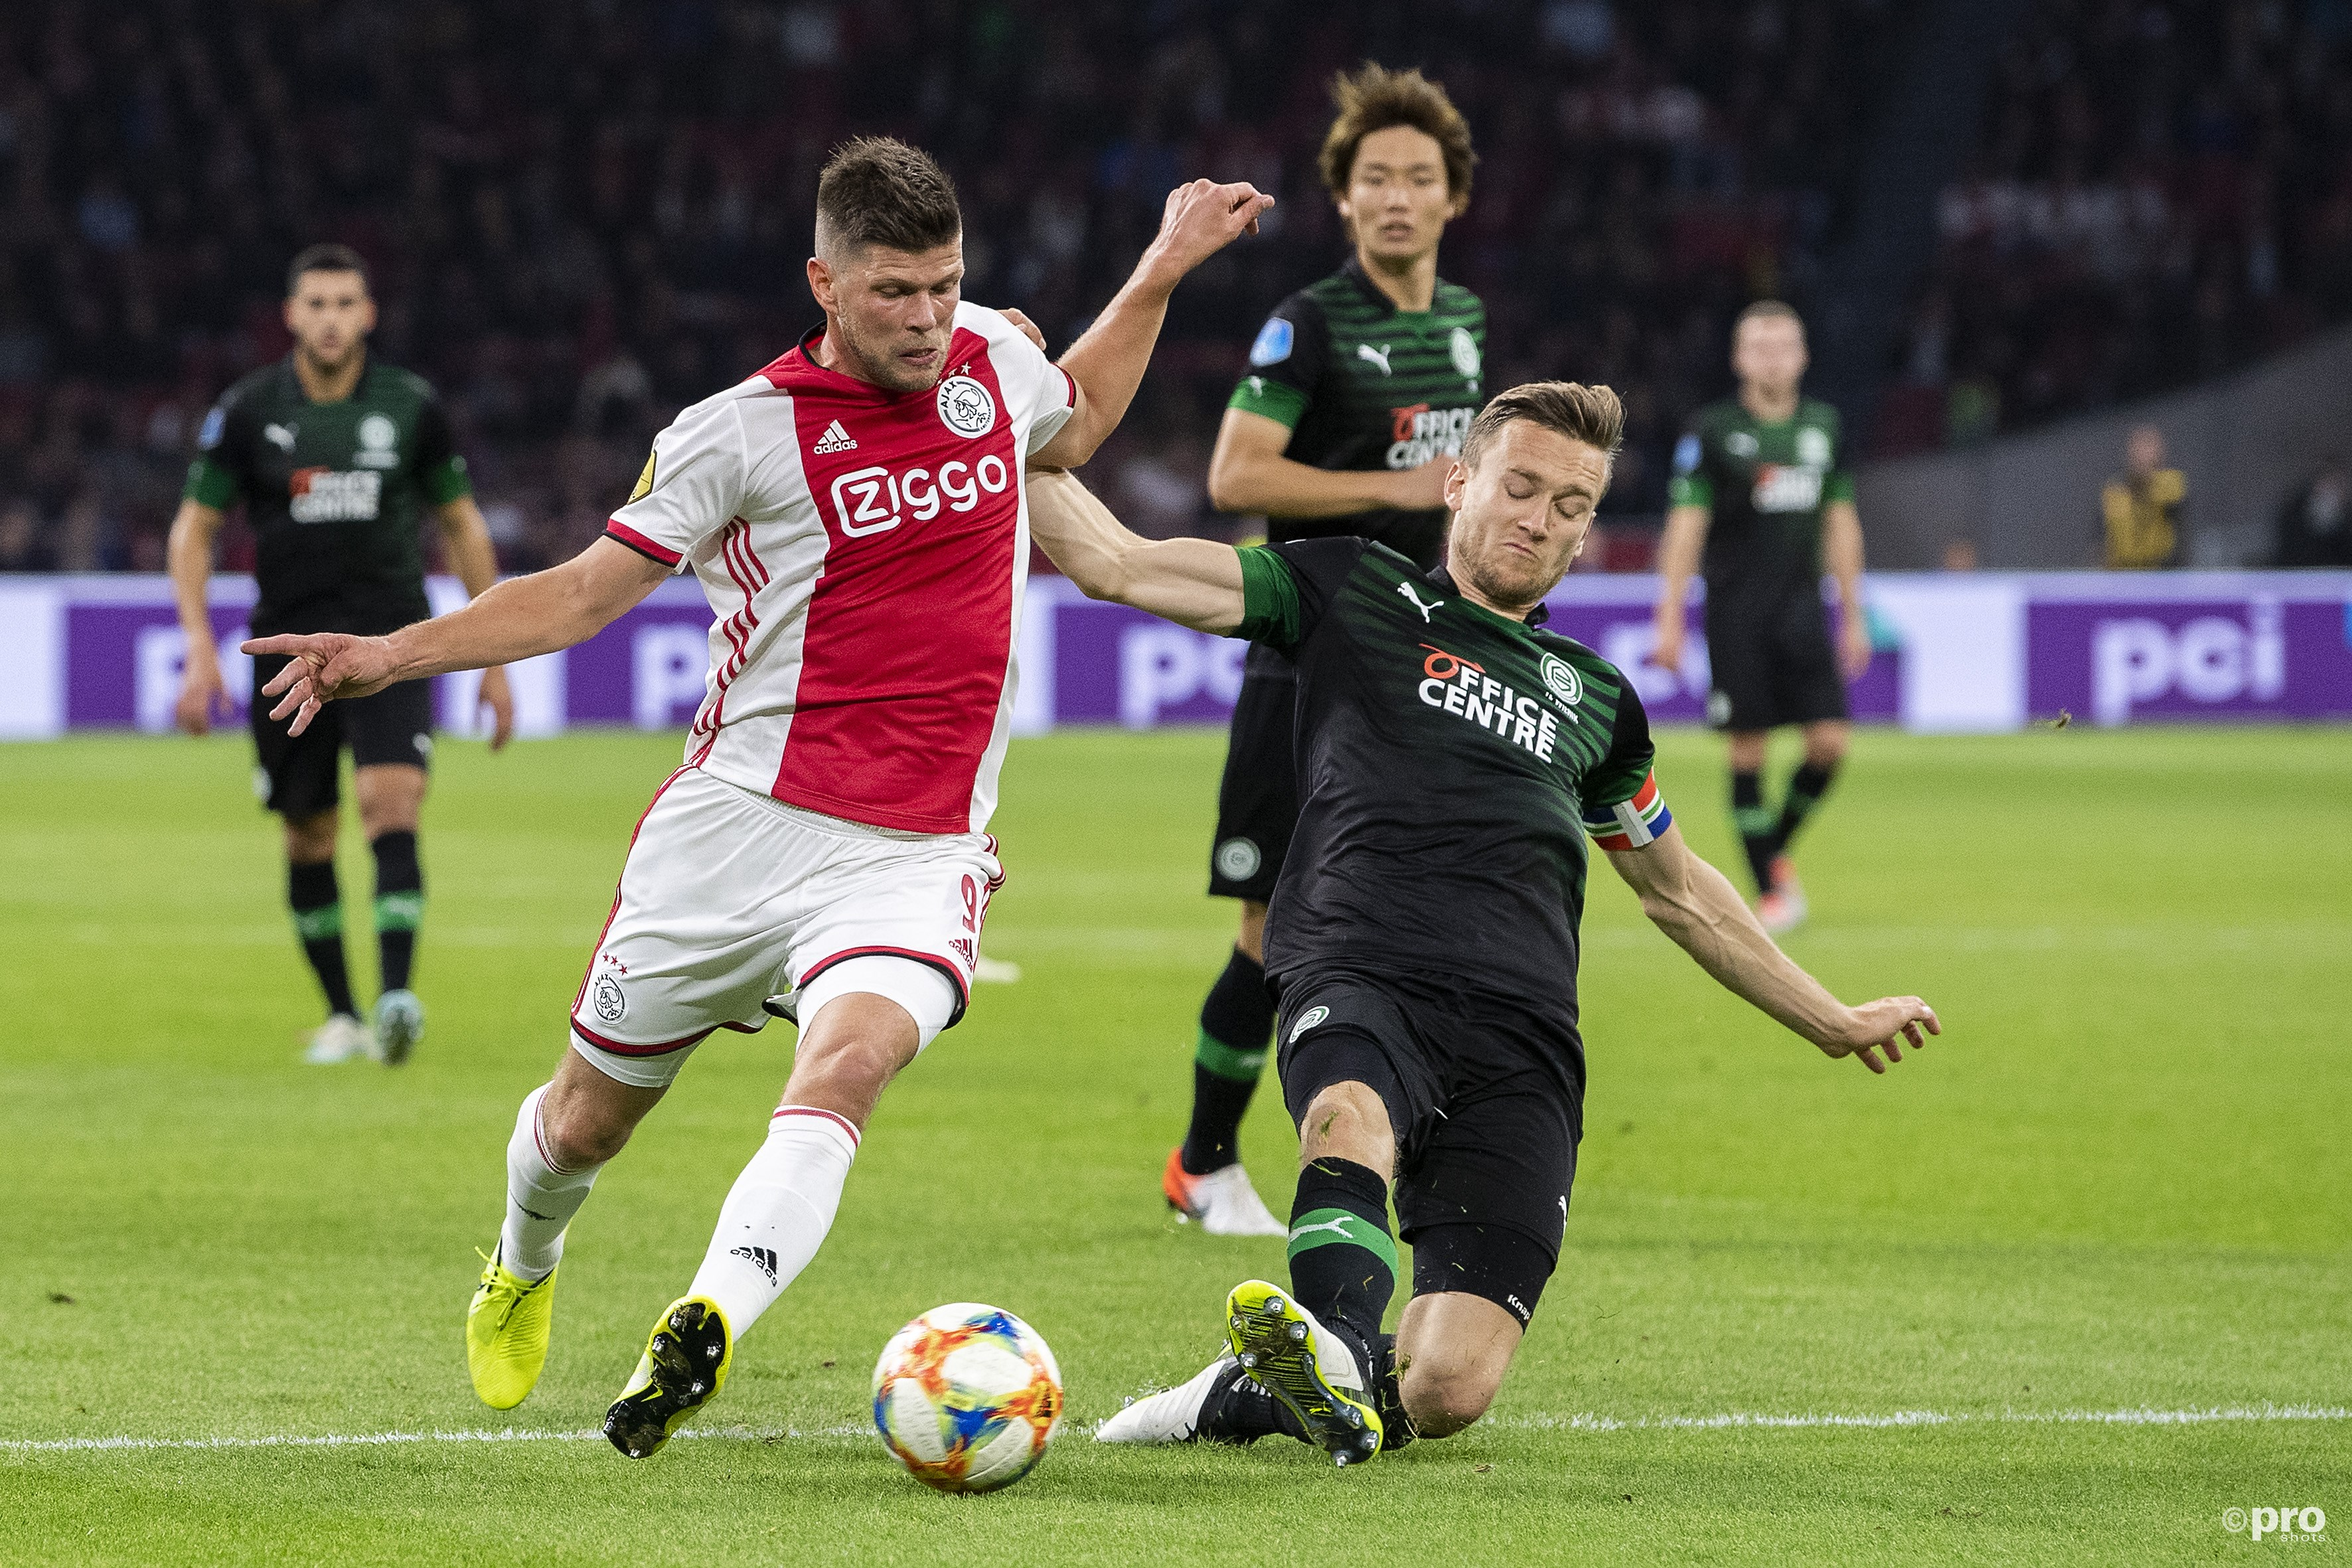 Huntelaar in duel met Te Wierik. (PRO SHOTS/Jasper Ruhe)